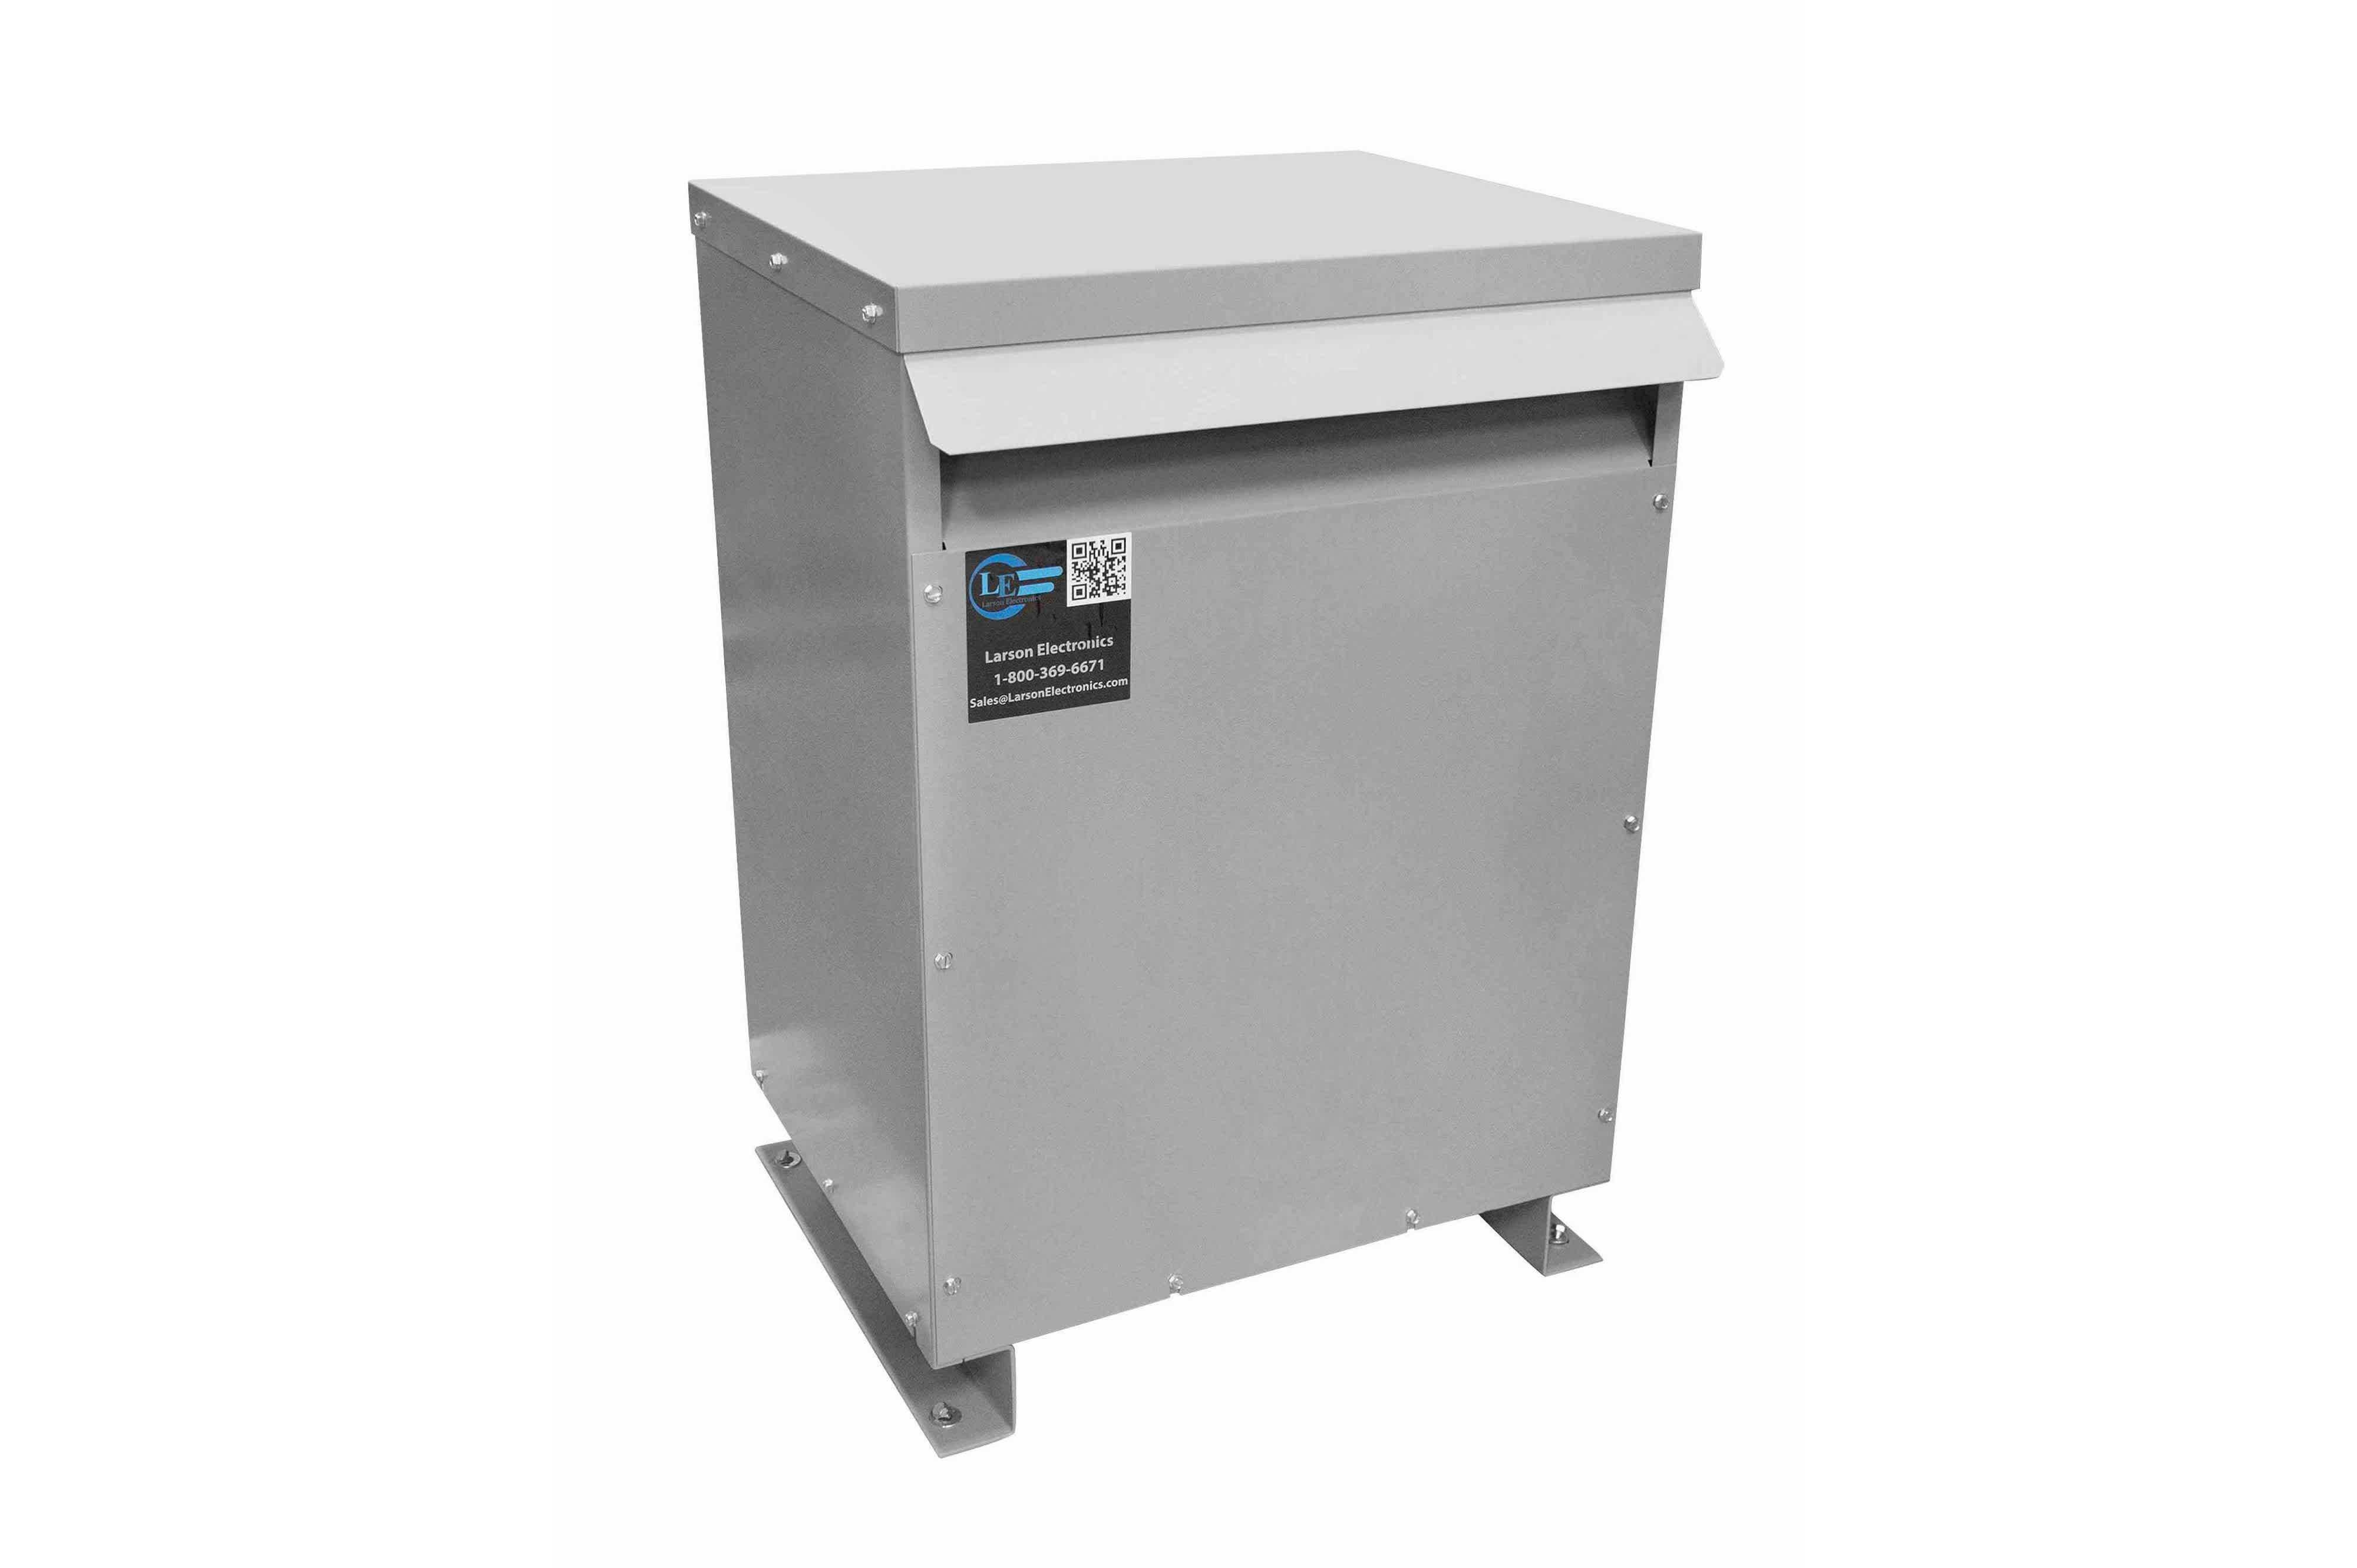 75 kVA 3PH DOE Transformer, 240V Delta Primary, 380Y/220 Wye-N Secondary, N3R, Ventilated, 60 Hz